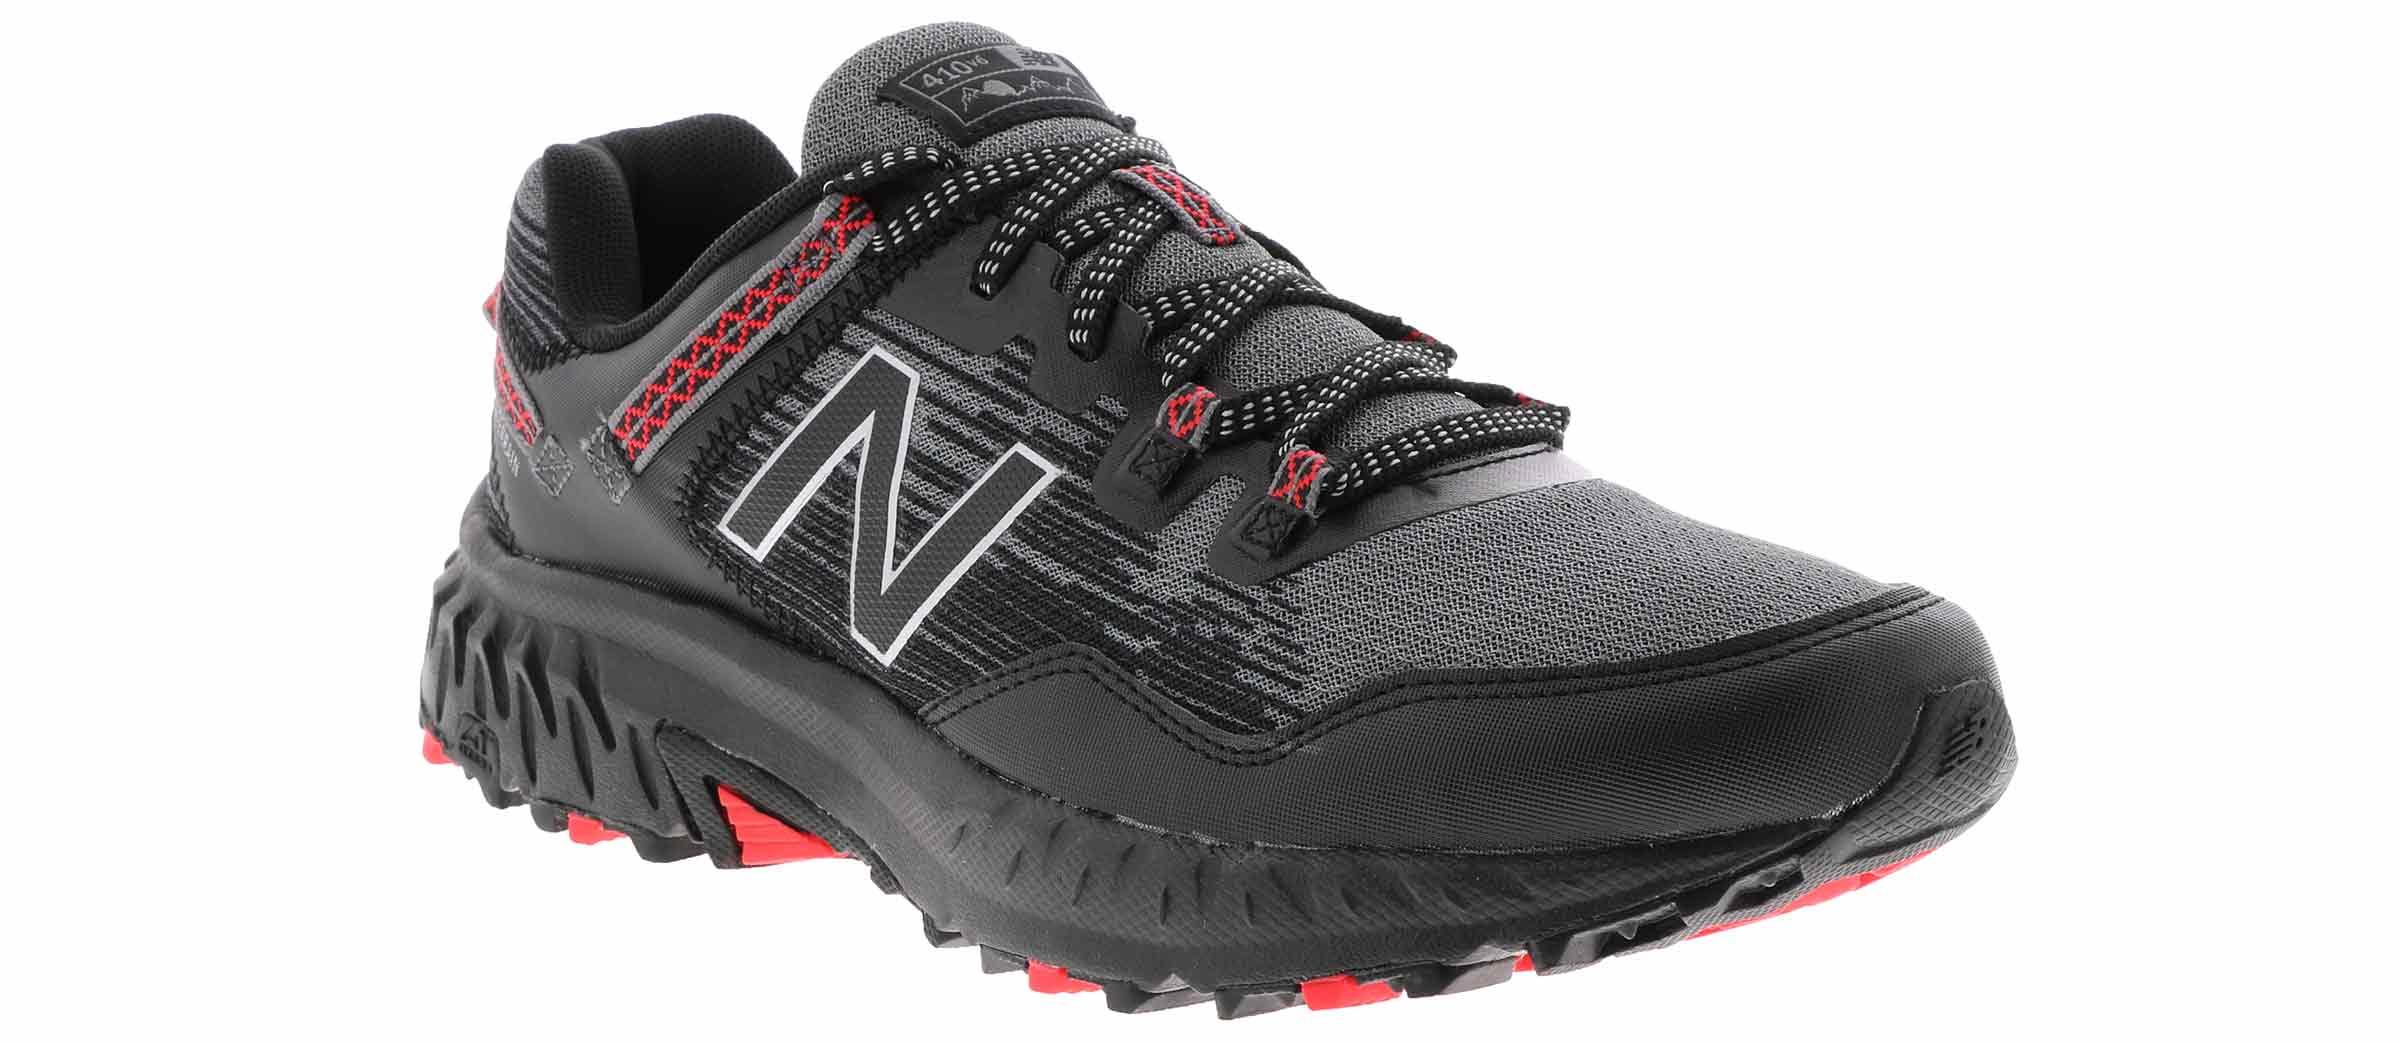 New Balance Mens MT410V6 Shoes